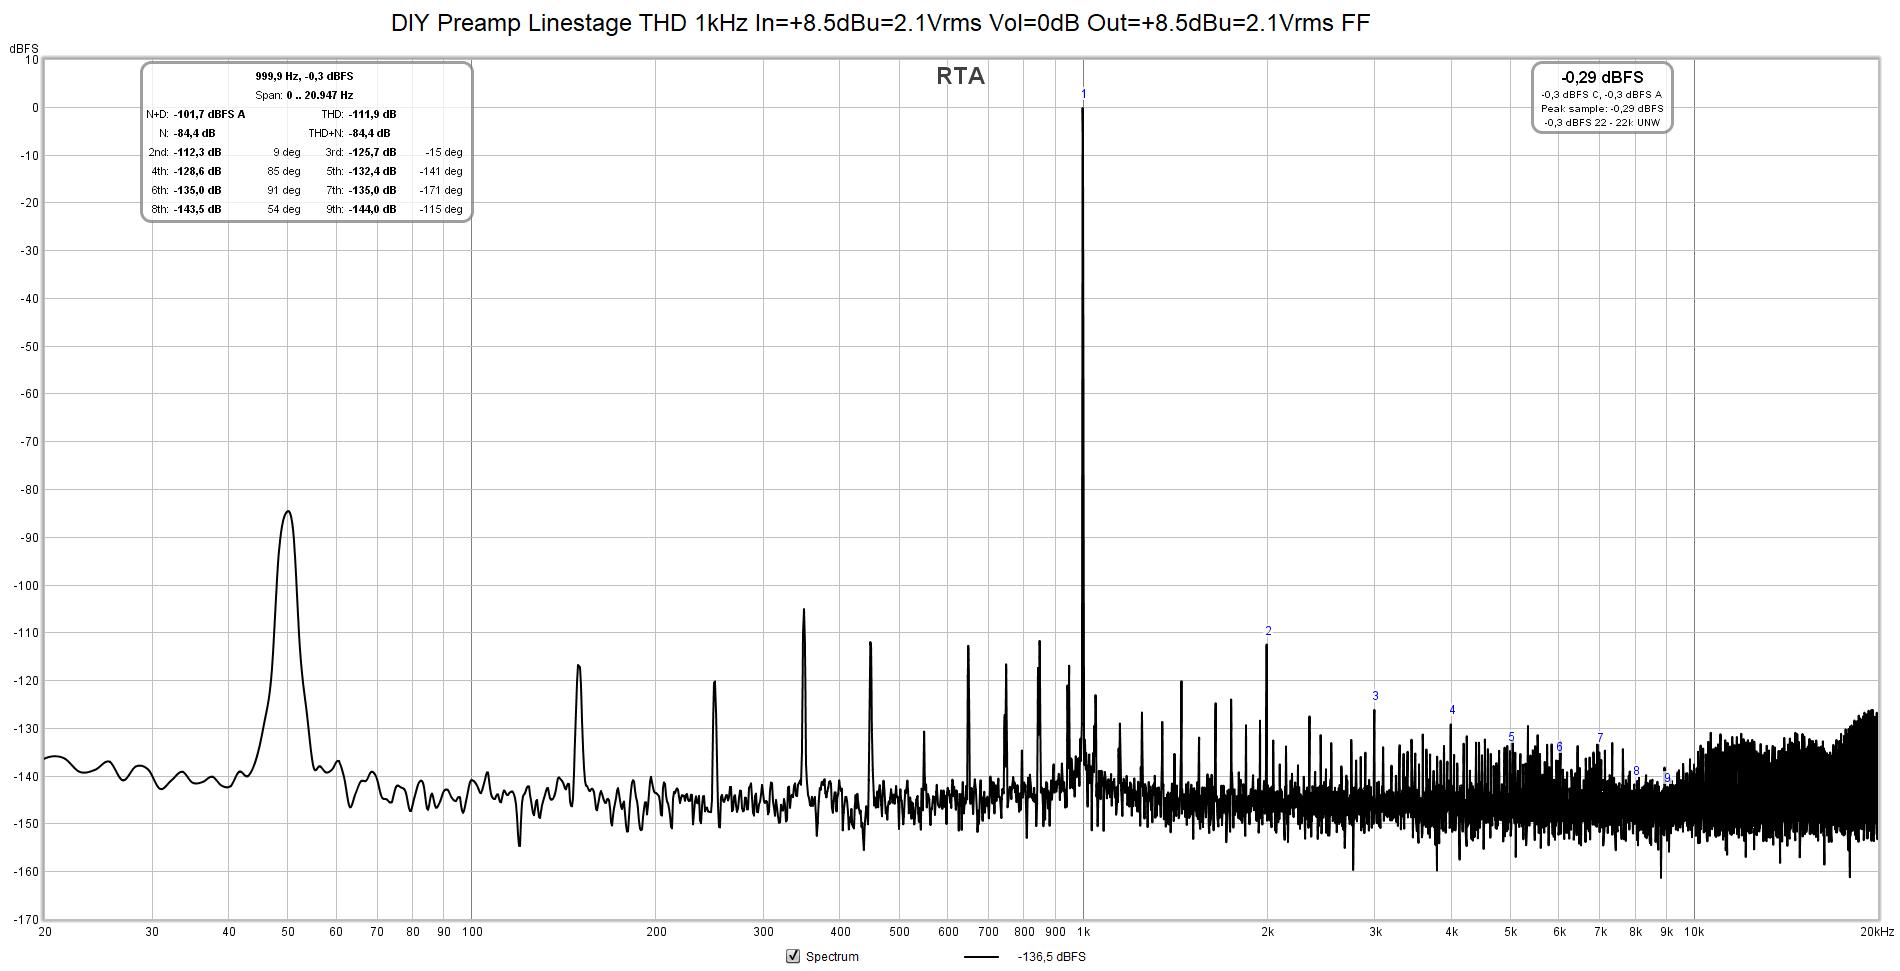 DIY Preamp Linestage THD 1kHz In=+8.5dBu=2.1Vrms Vol=0dB Out=+8.5dBu=2.1Vrms FFT=32k avg=4.png